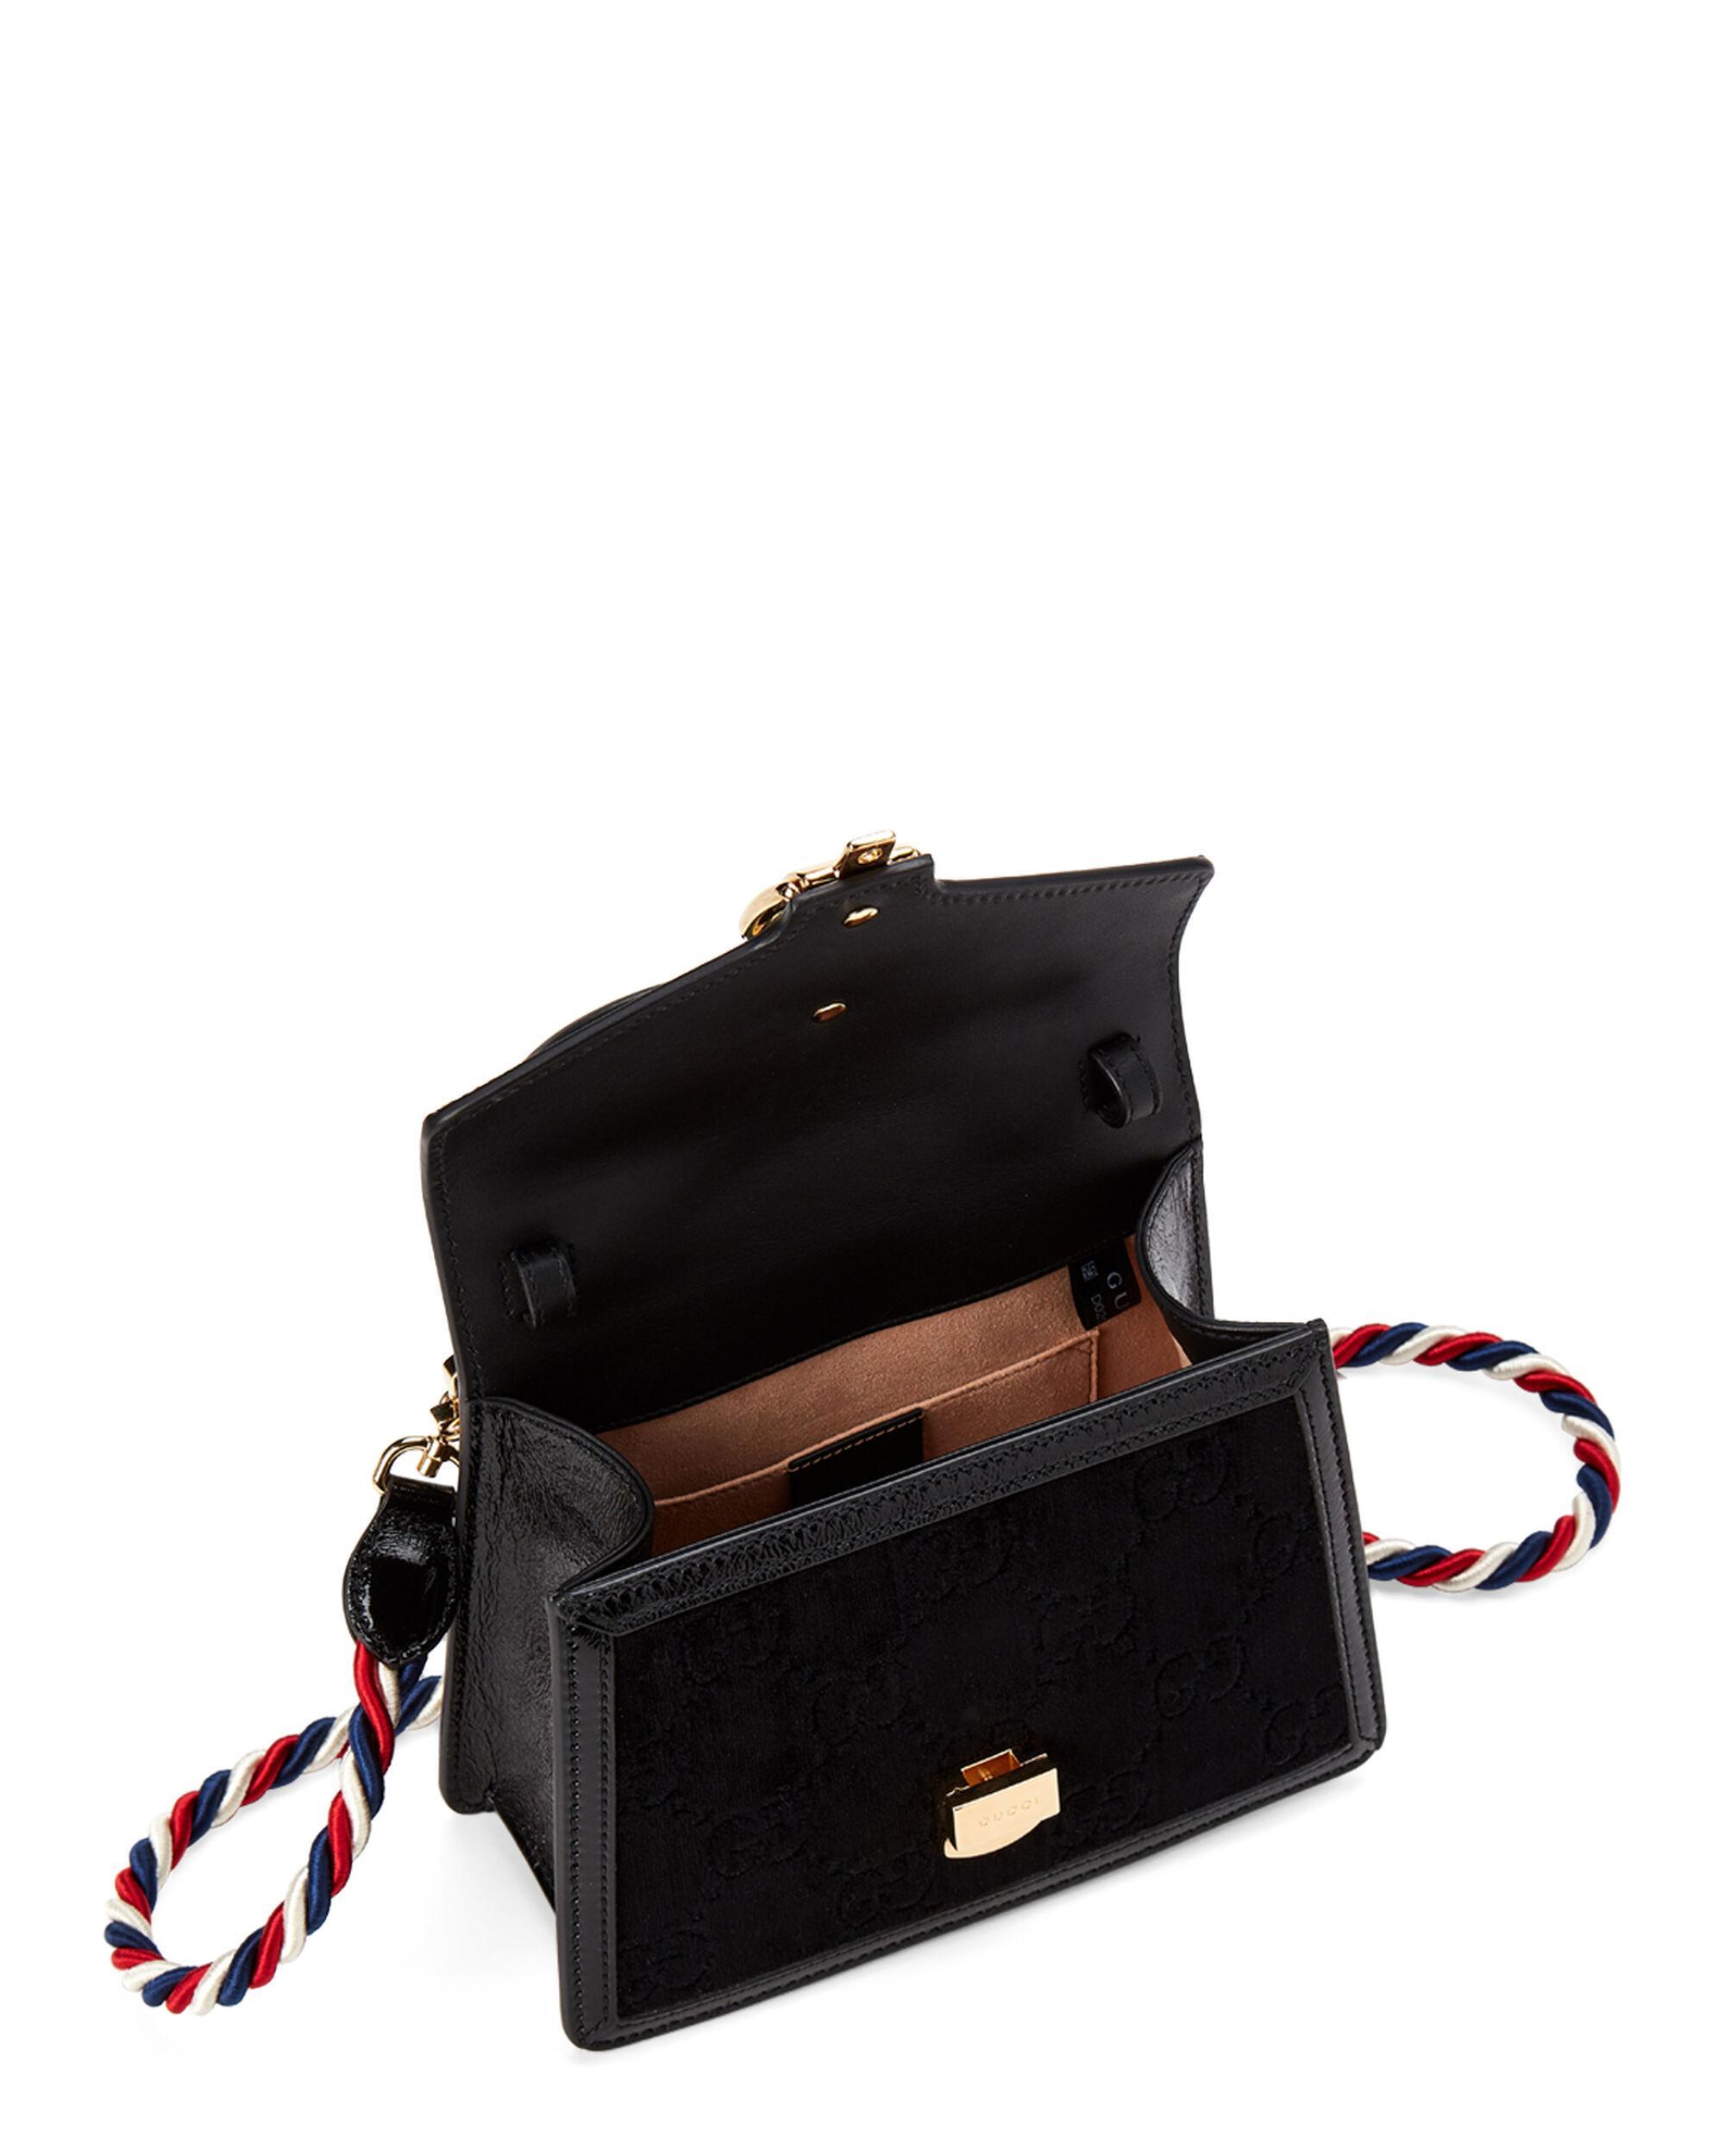 1c887d4c0 ... Black Sylvie GG Velvet Mini Bag - Lyst. Visit Century 21. Tap to visit  site